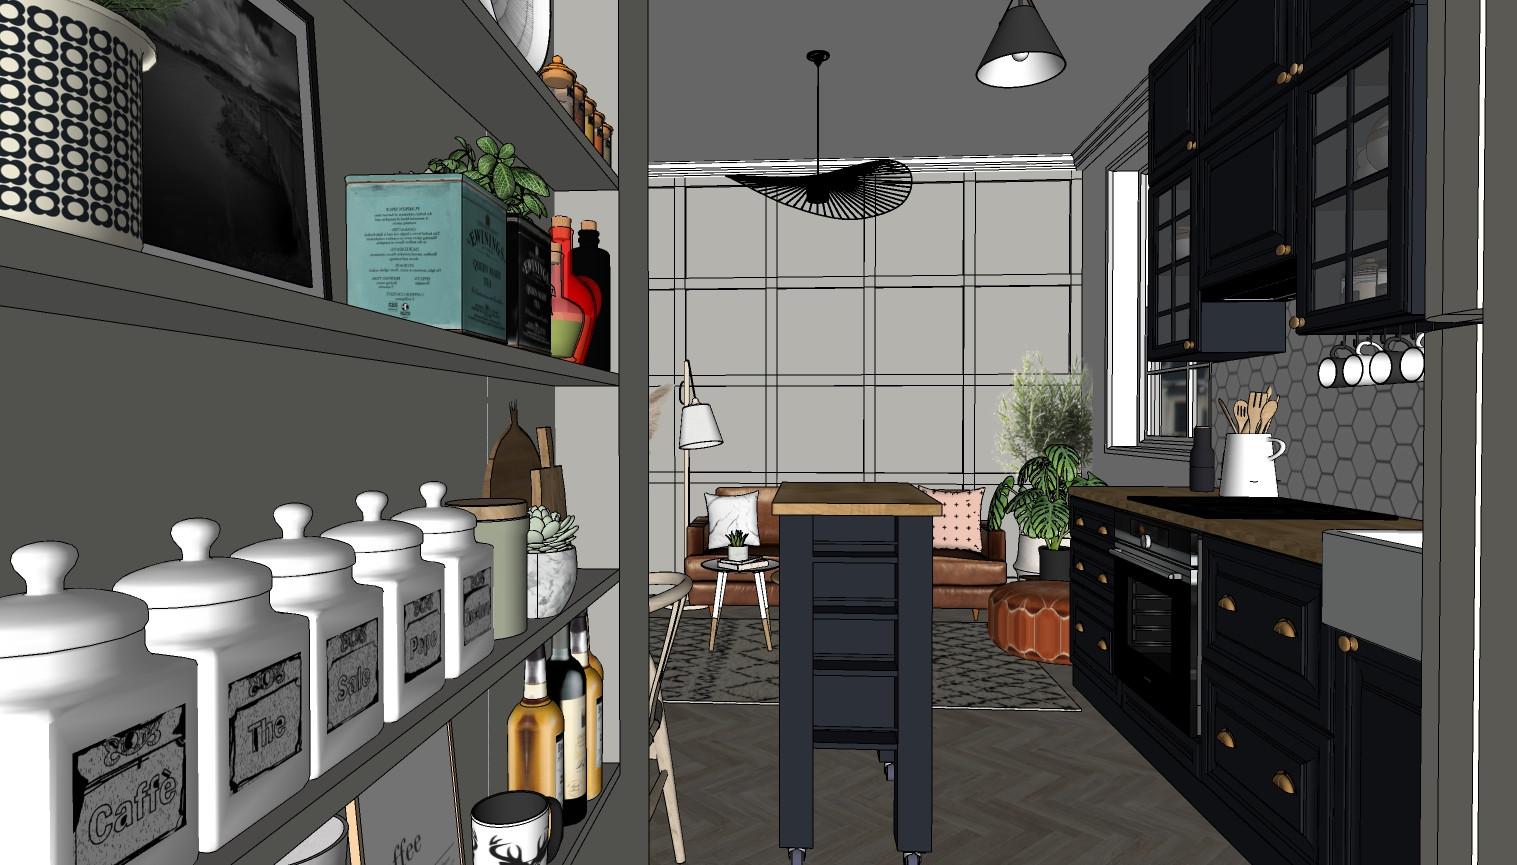 Interior-design-scandinavian-nordic-kitc